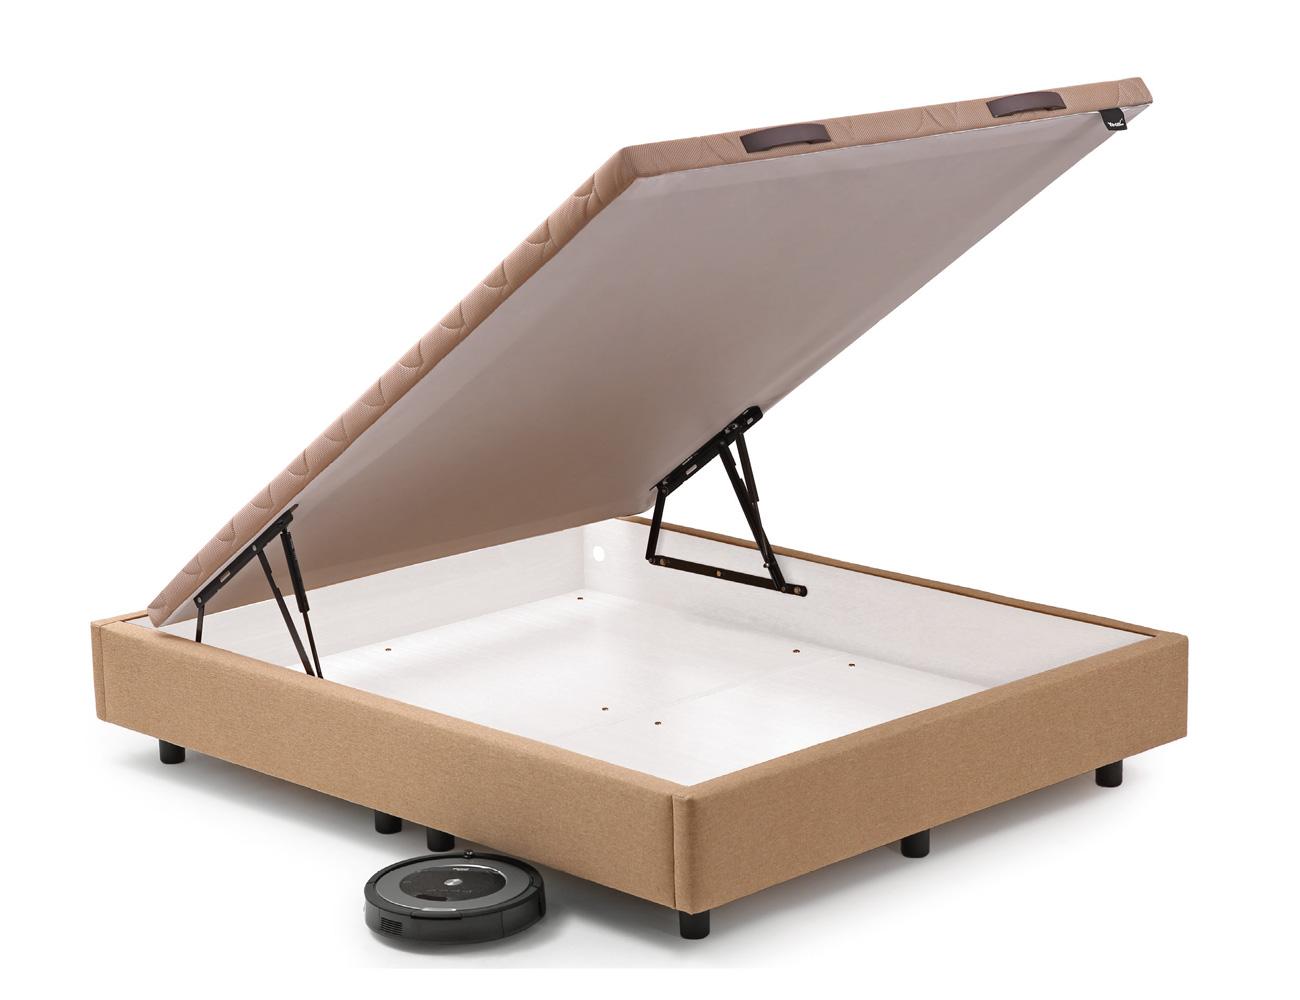 Canape robot limpieza detalle1